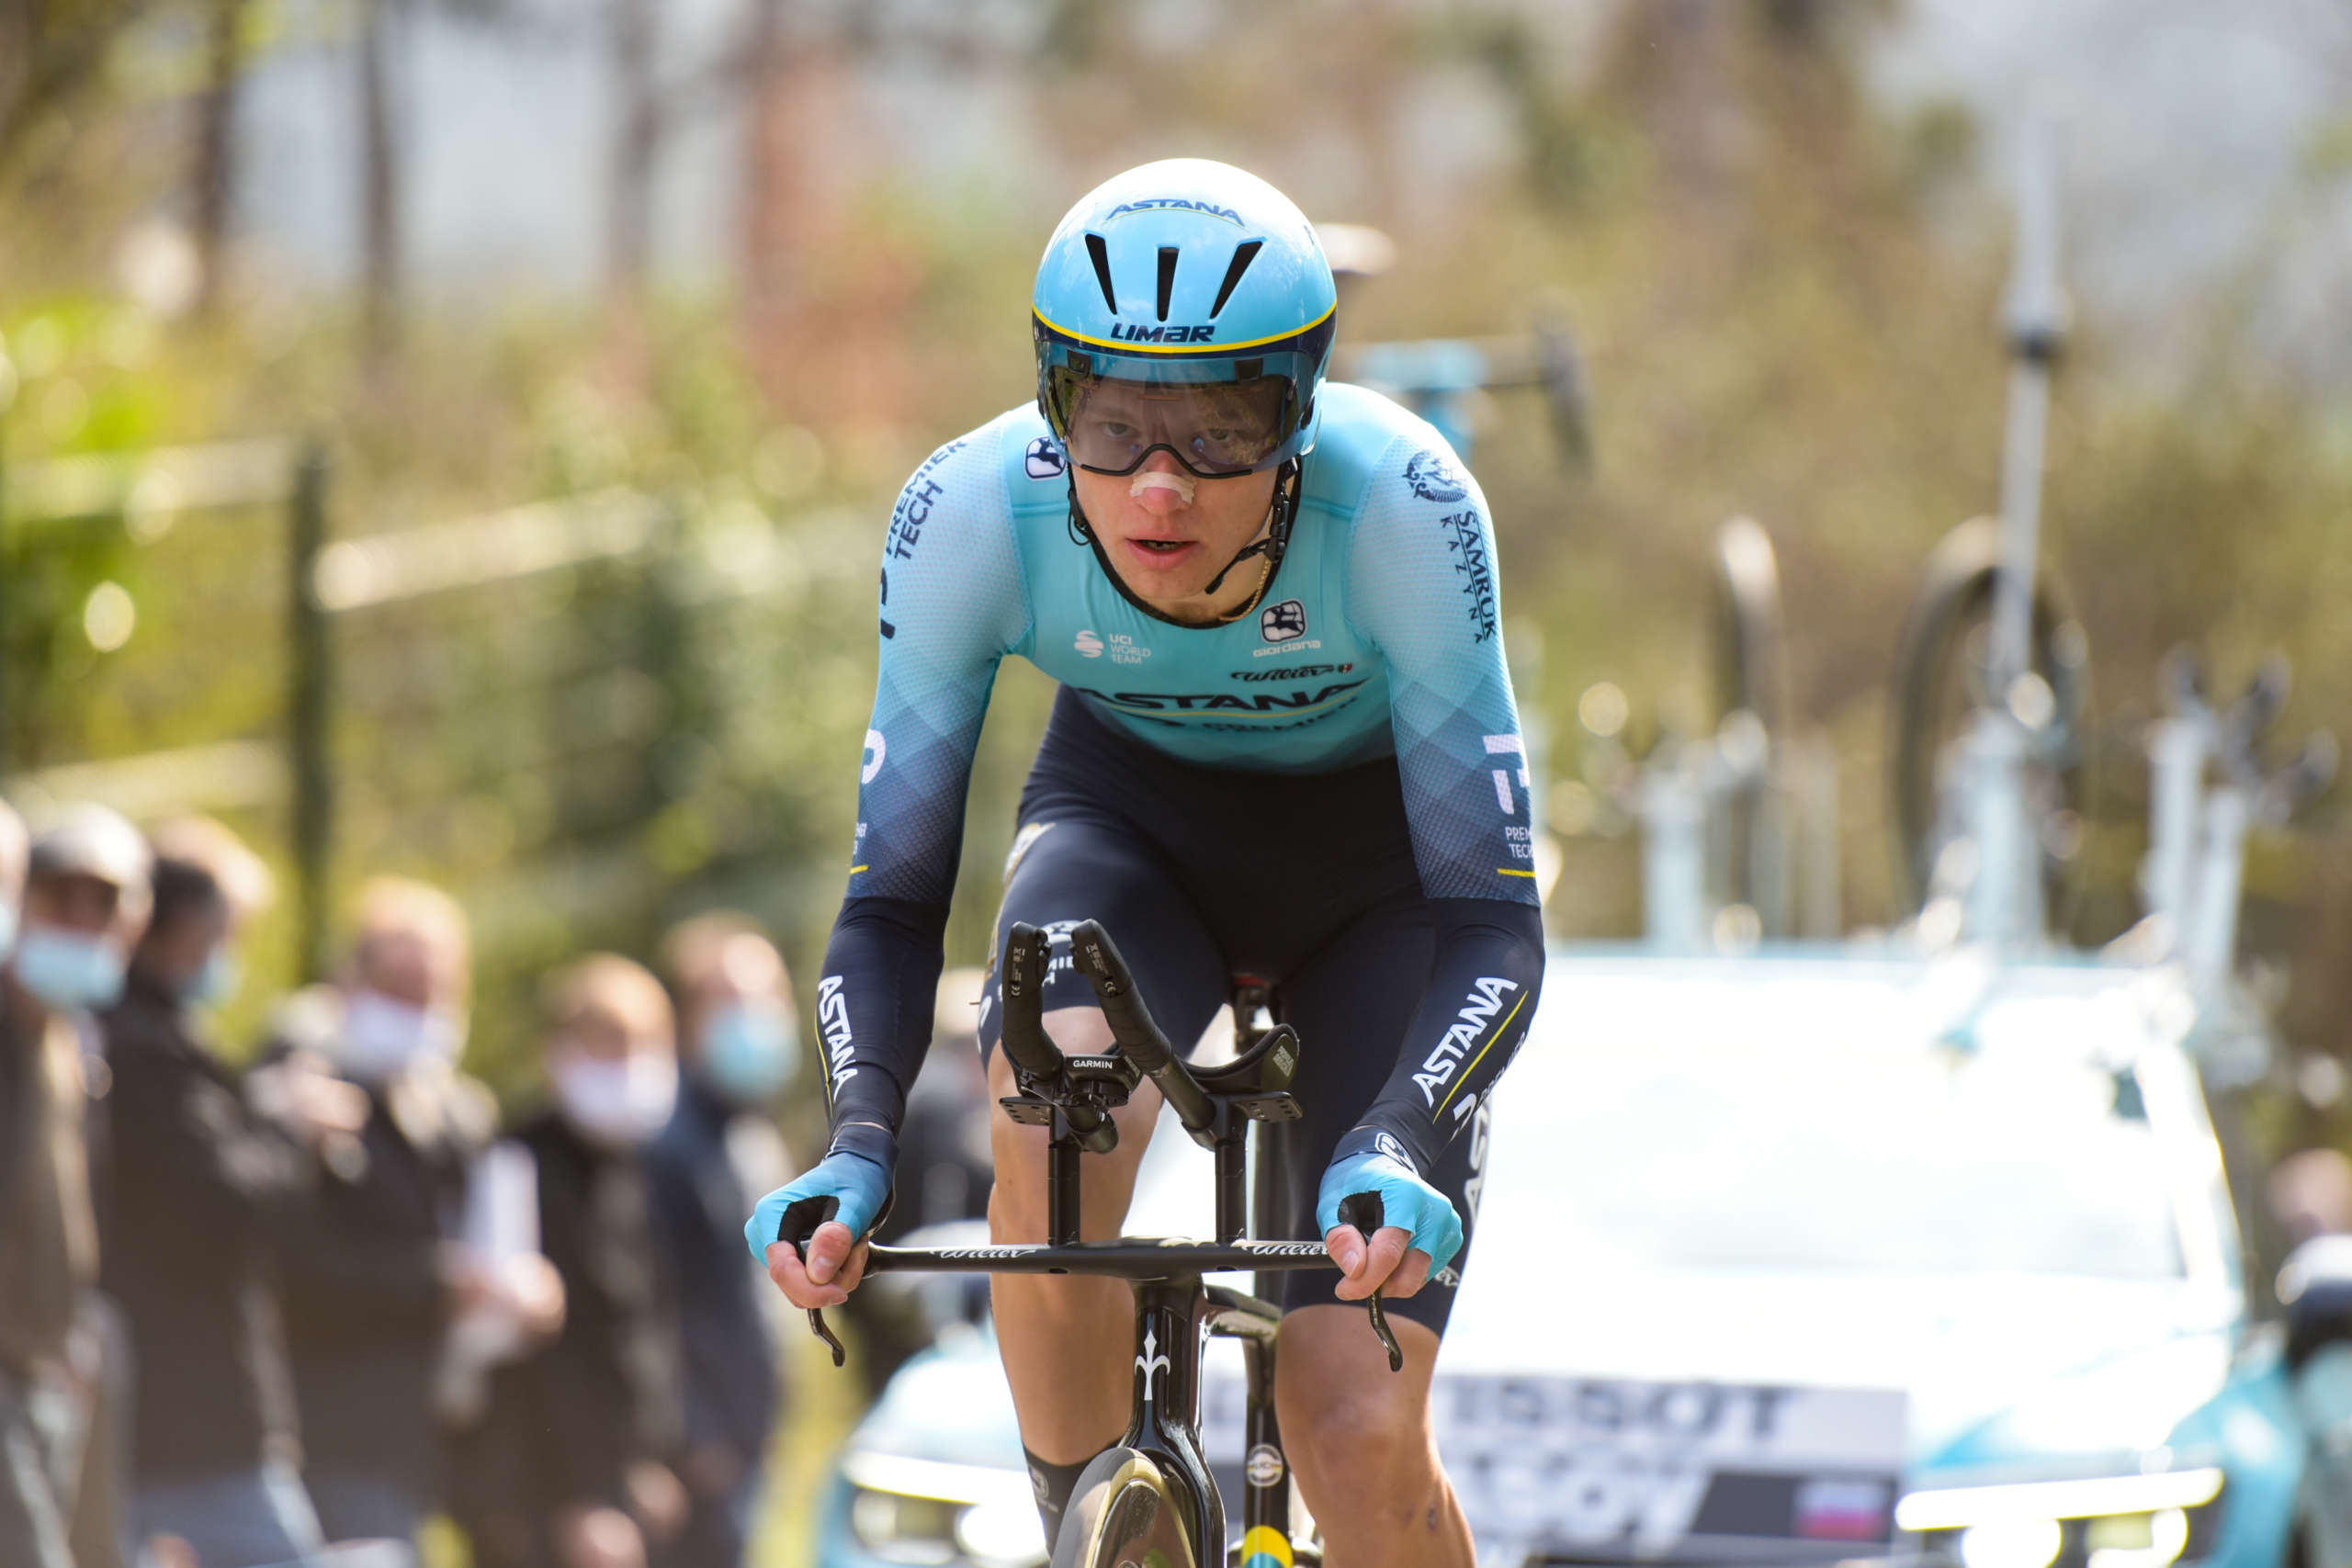 Aleksandr Vlasov Tour de France 2021